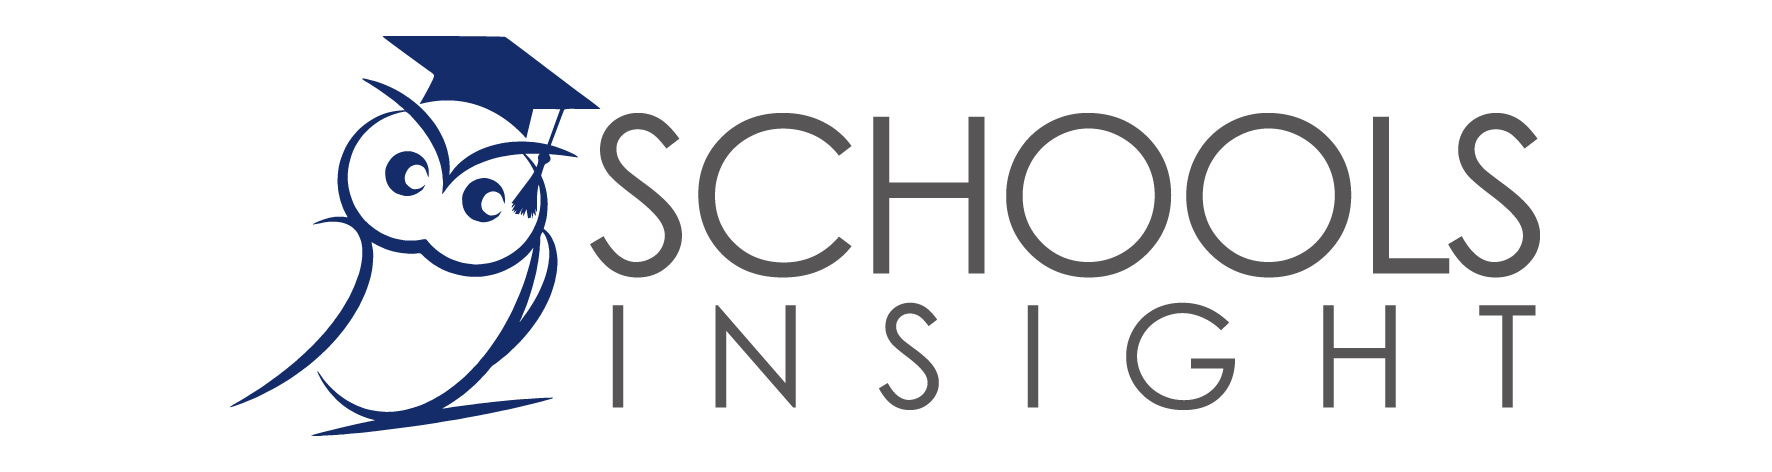 School's Insight